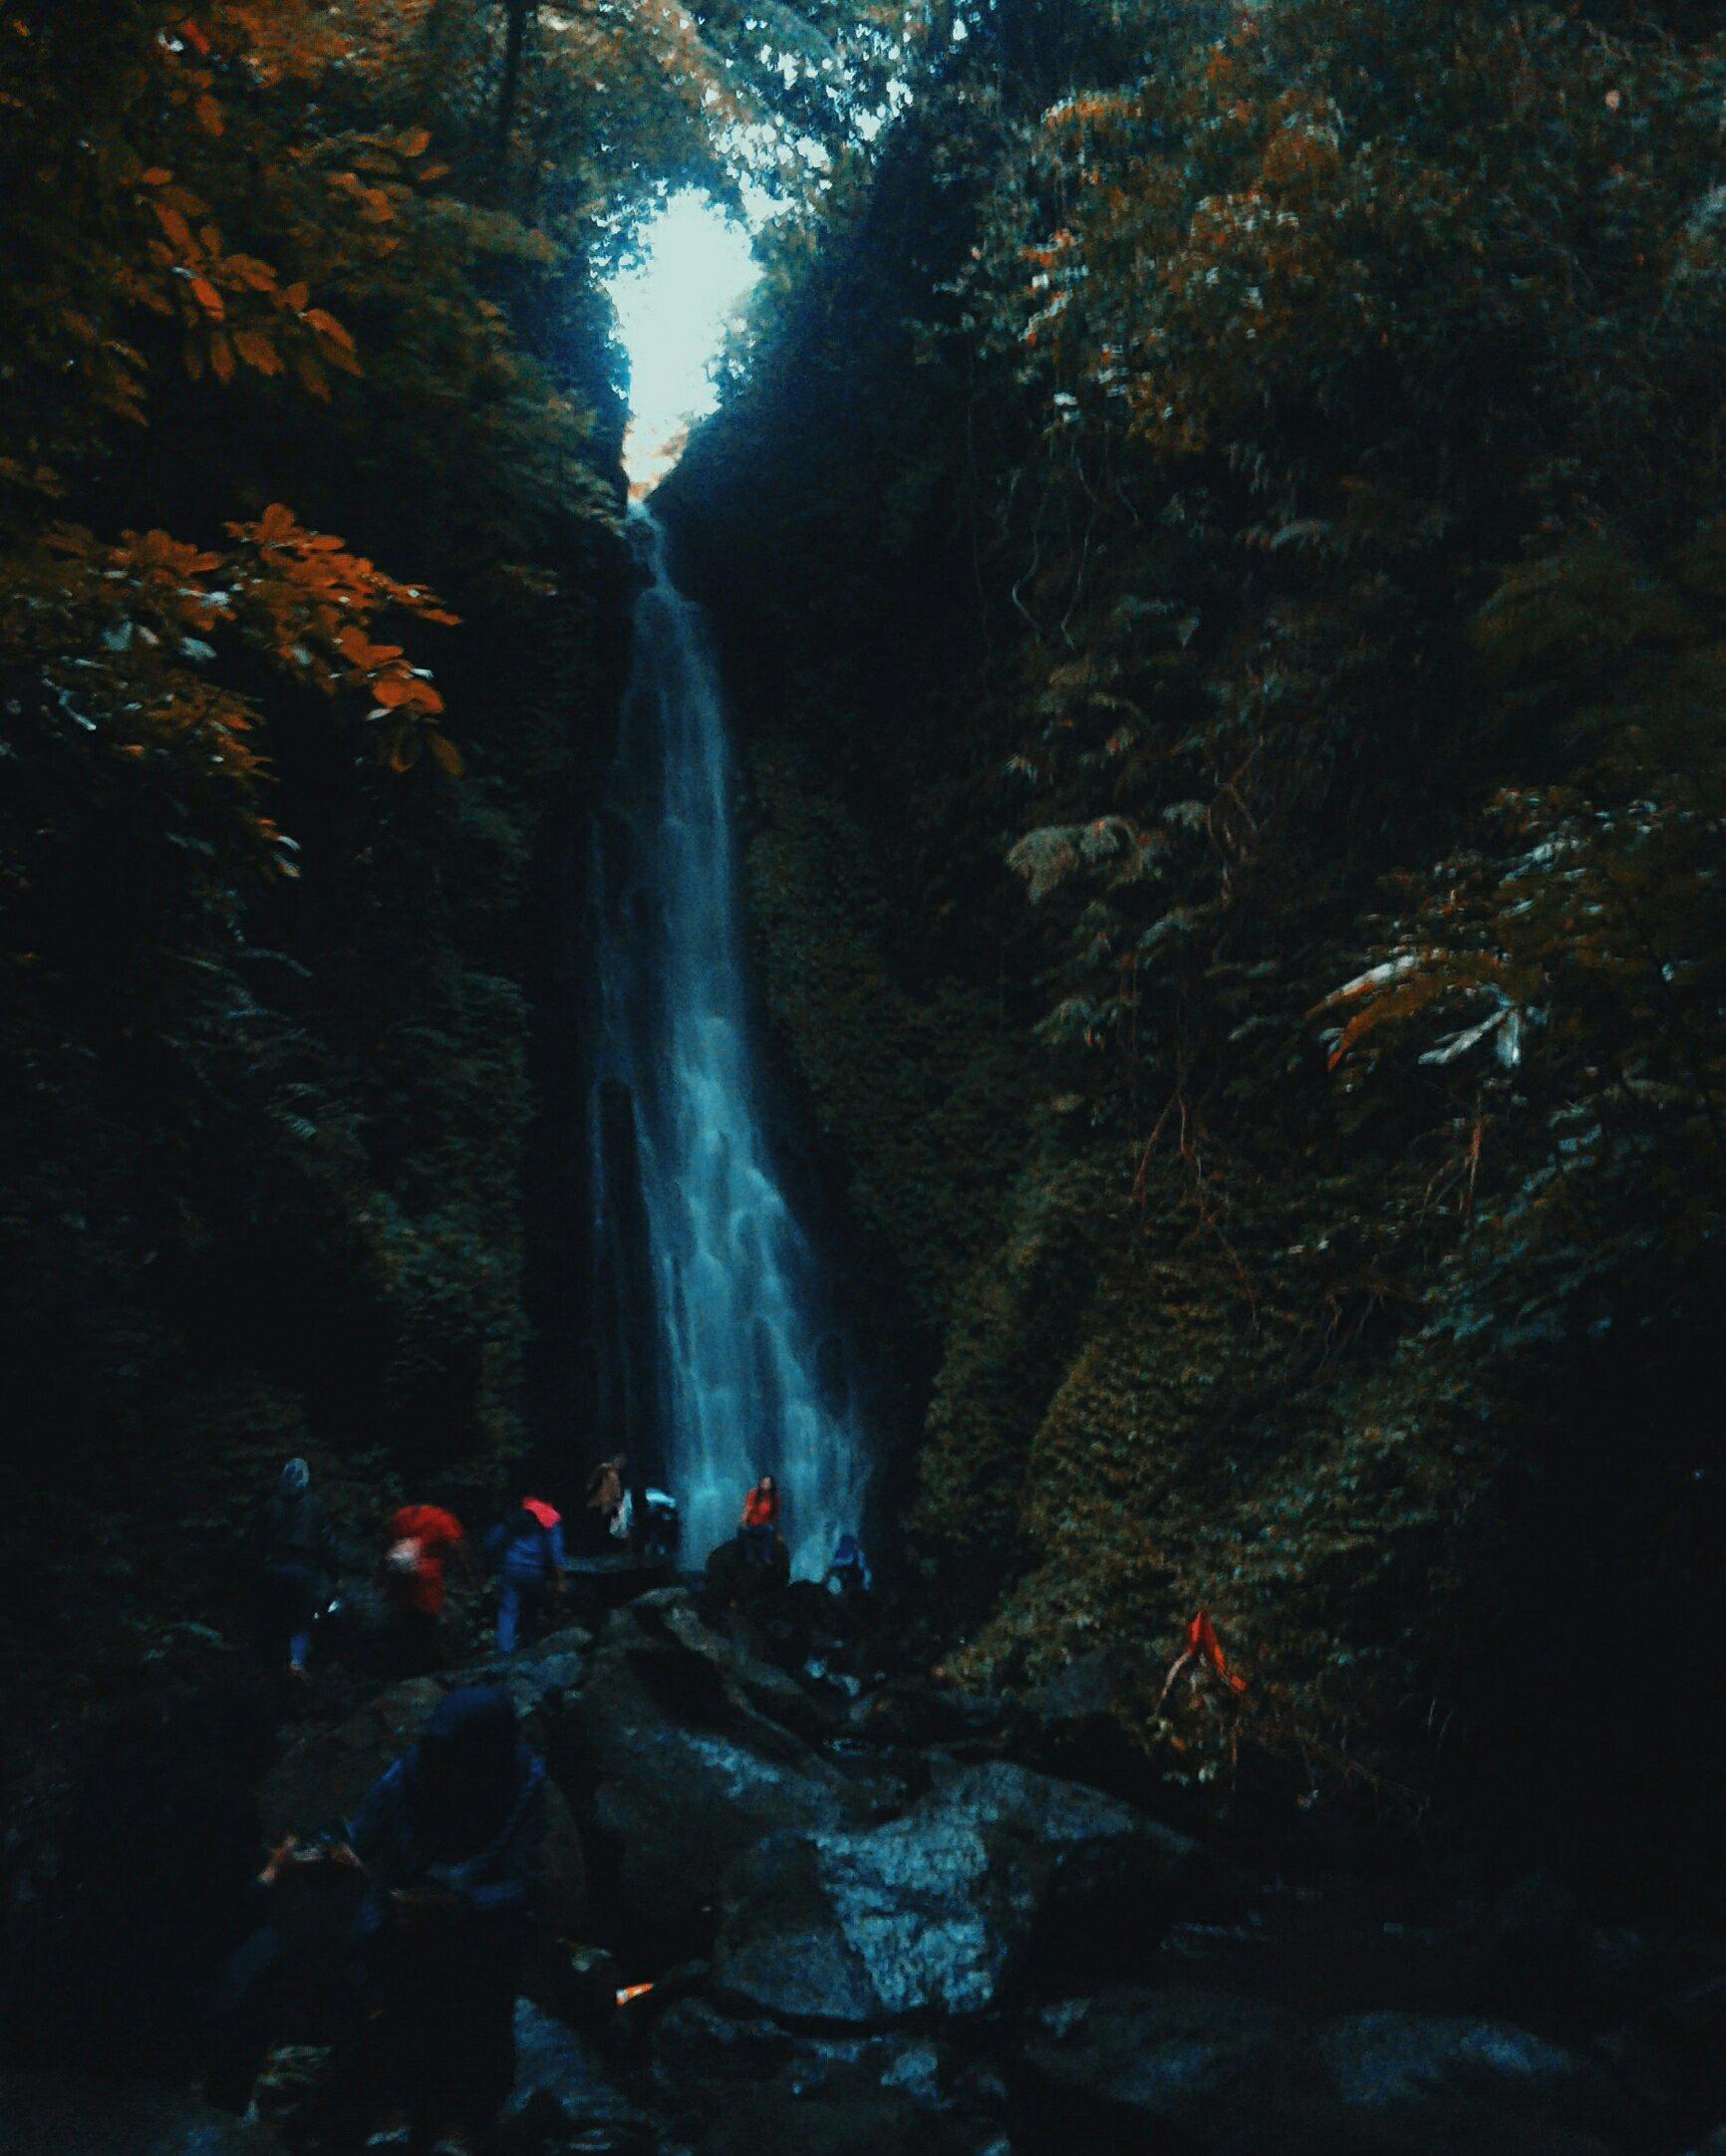 Hobiarin Dulu Jalan Ditempuh Sampai Air Terjun Cukup Baik Aliran